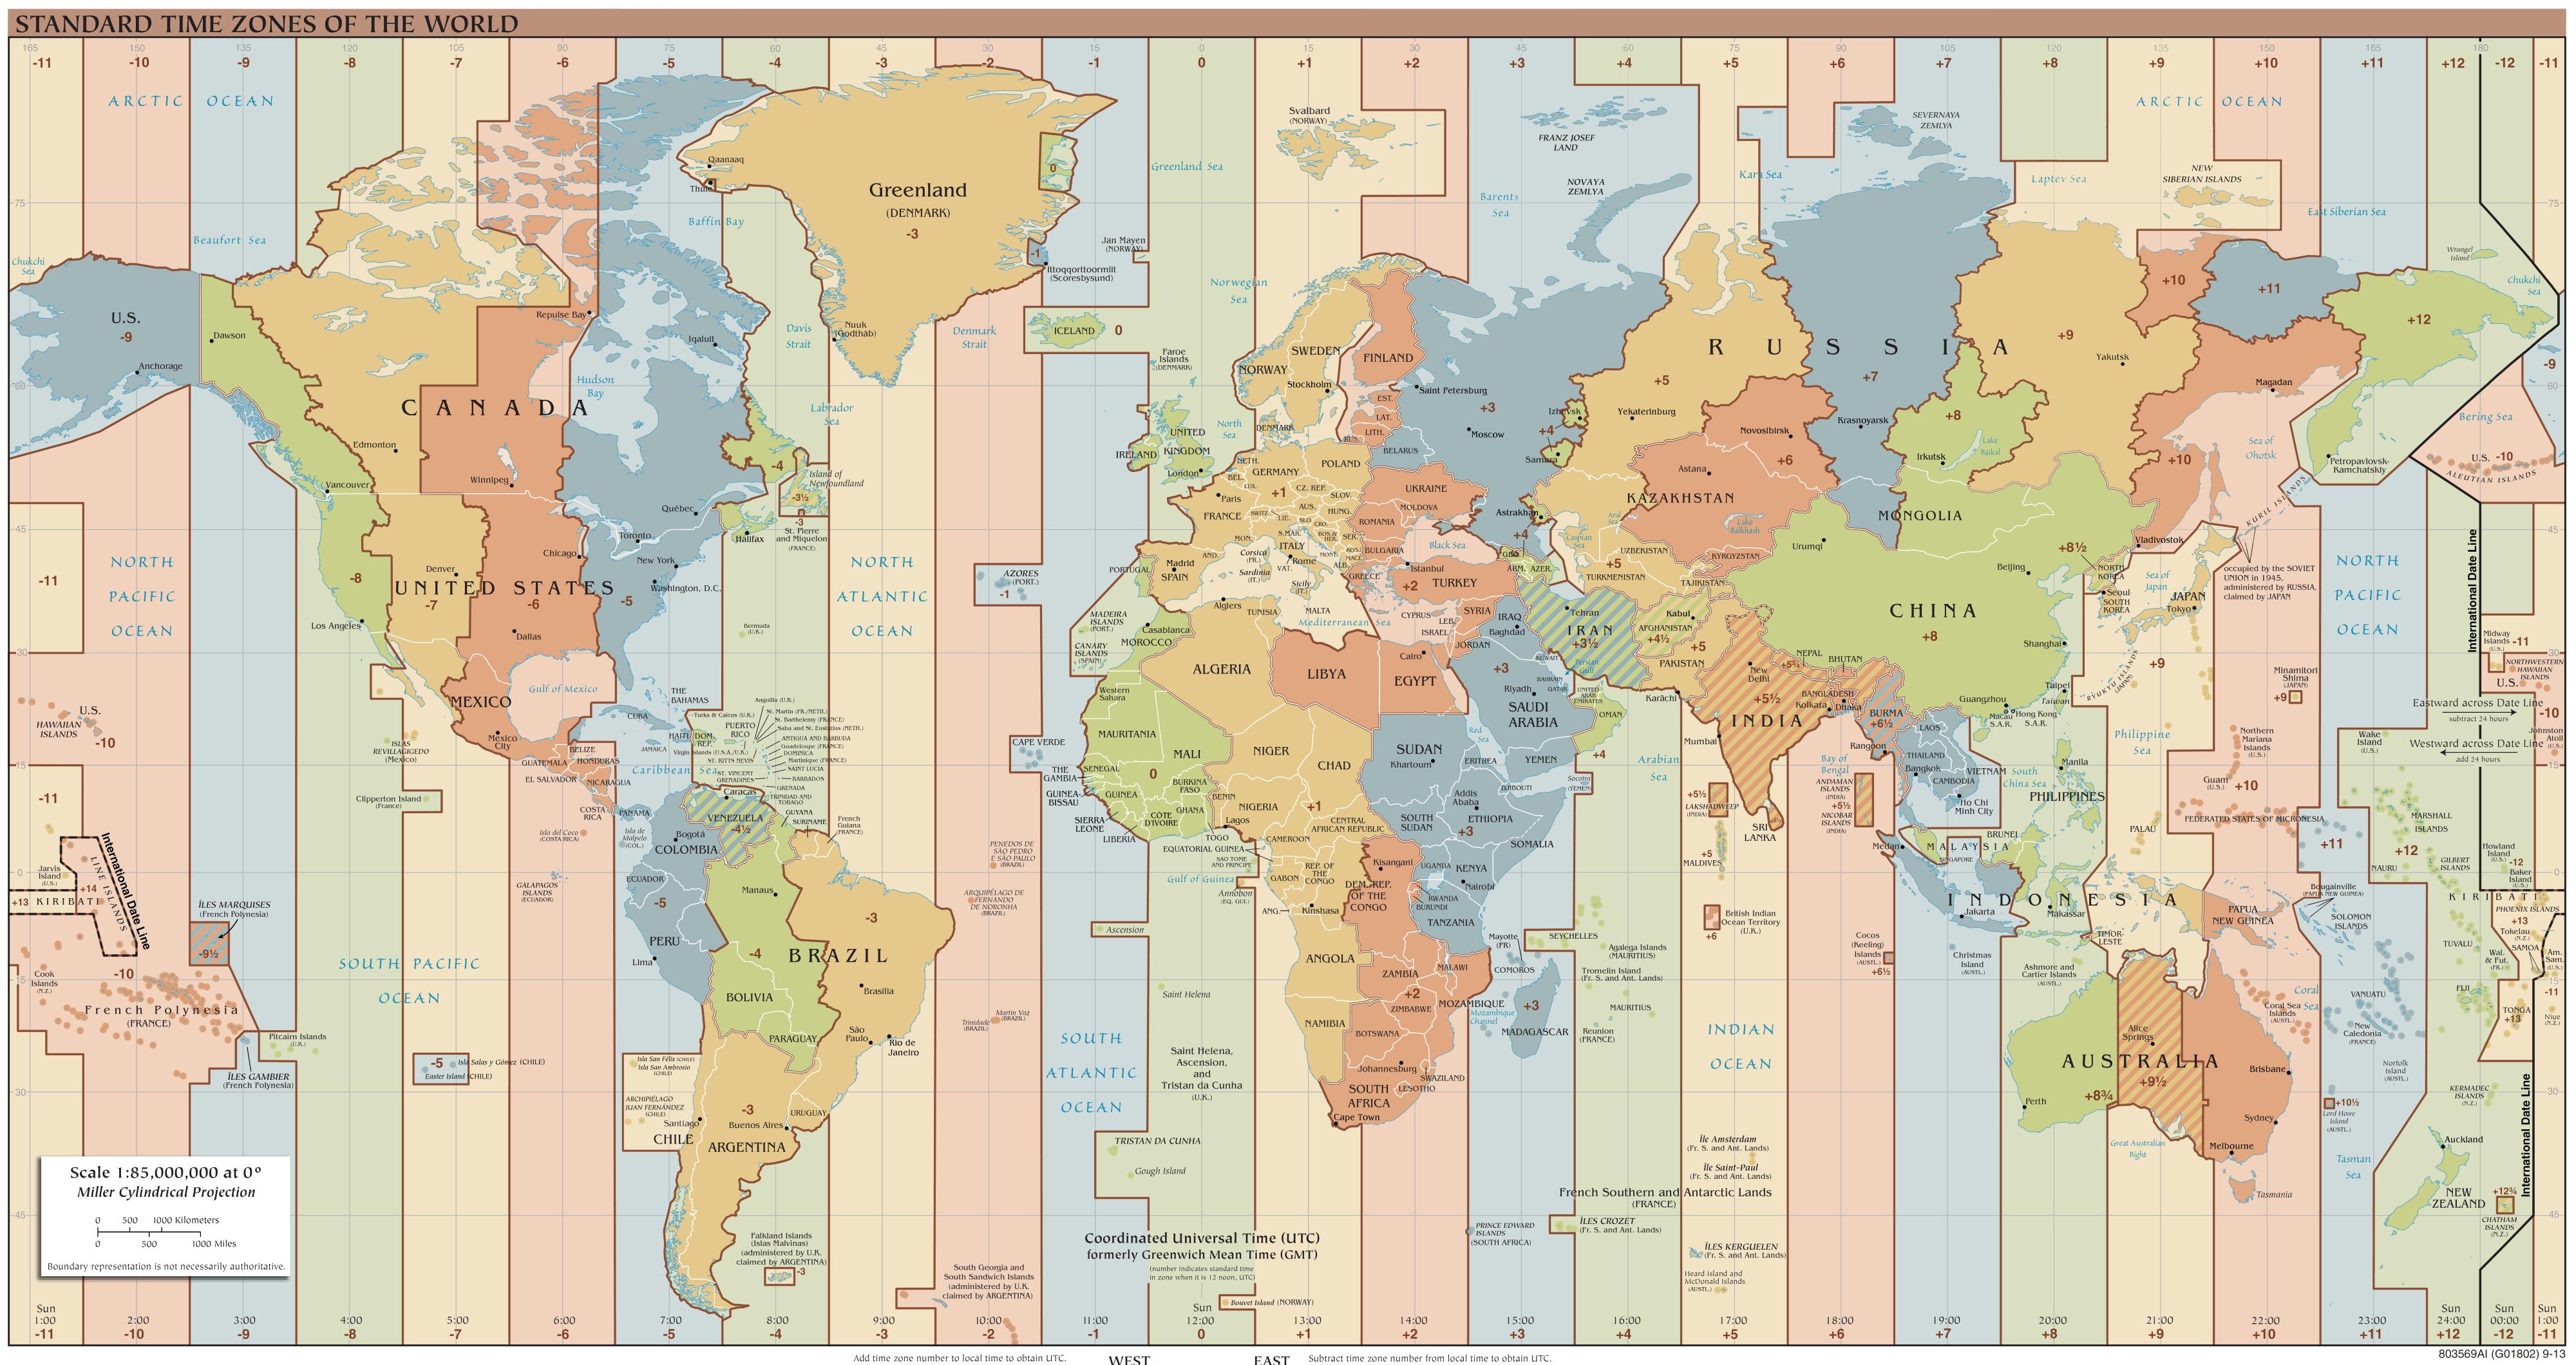 World time zones. Image credit: TimeZonesBoy, via Wikipedia Commons.